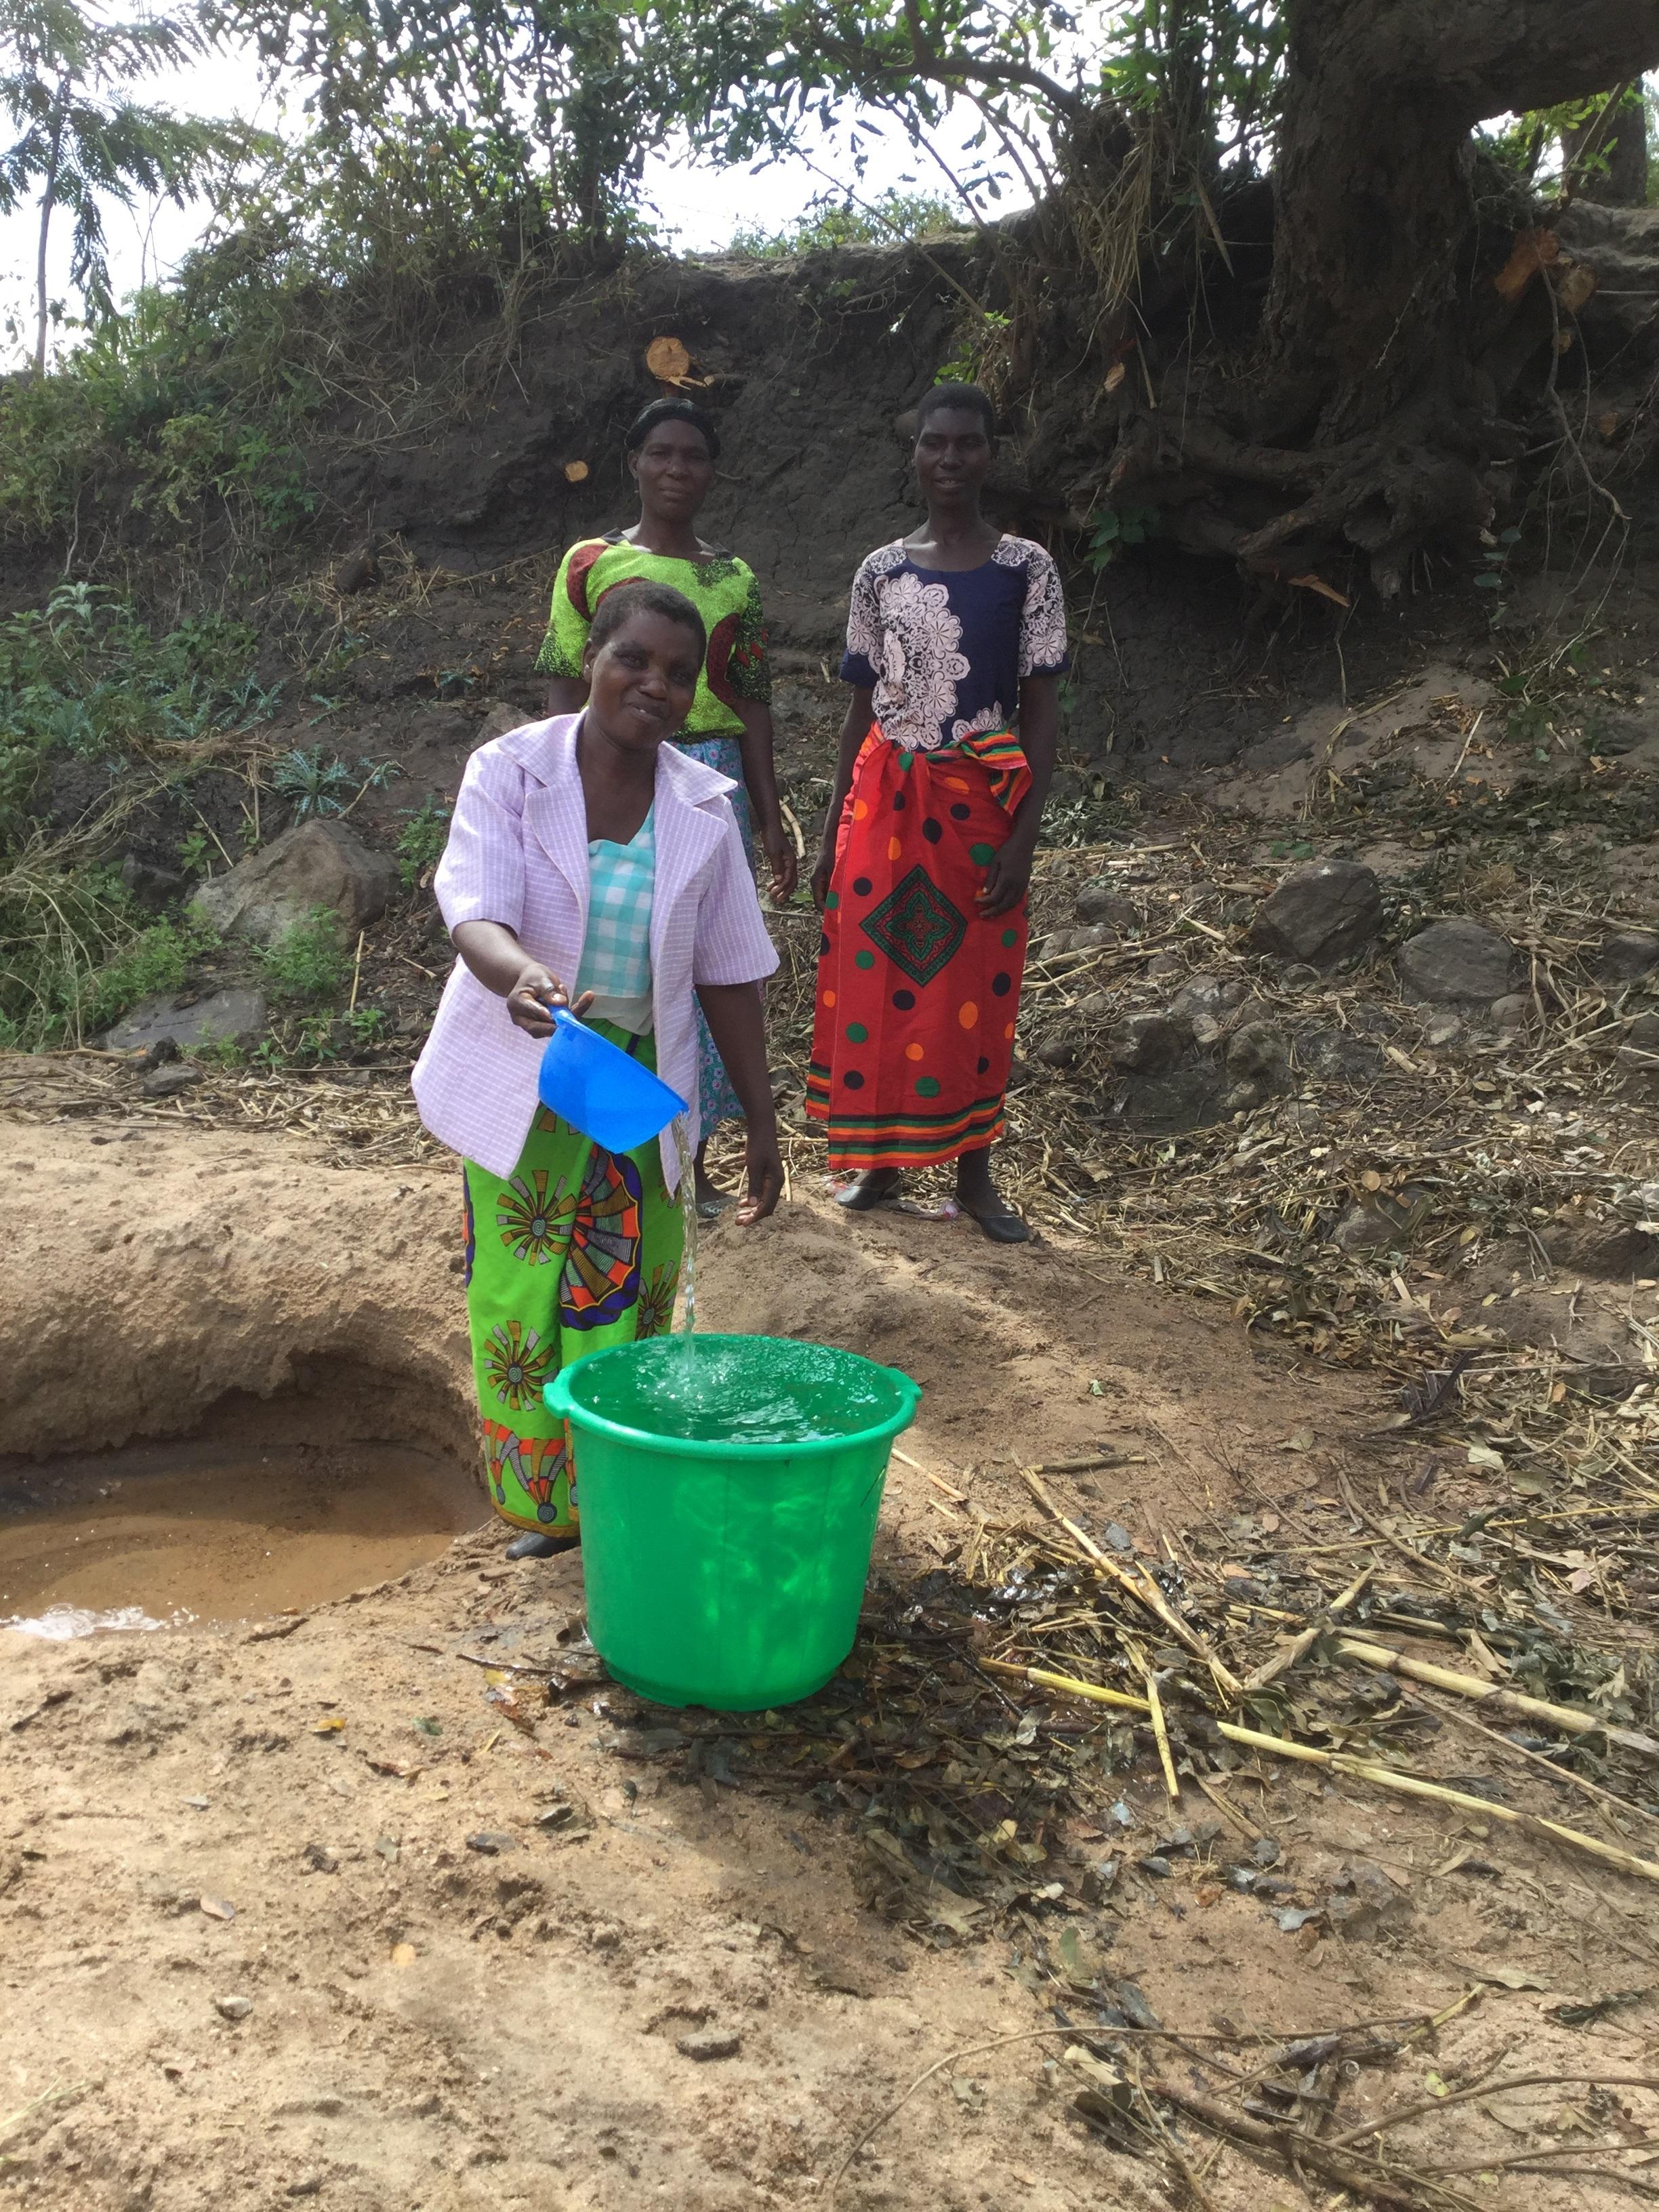 Image 1 Women at Water Source